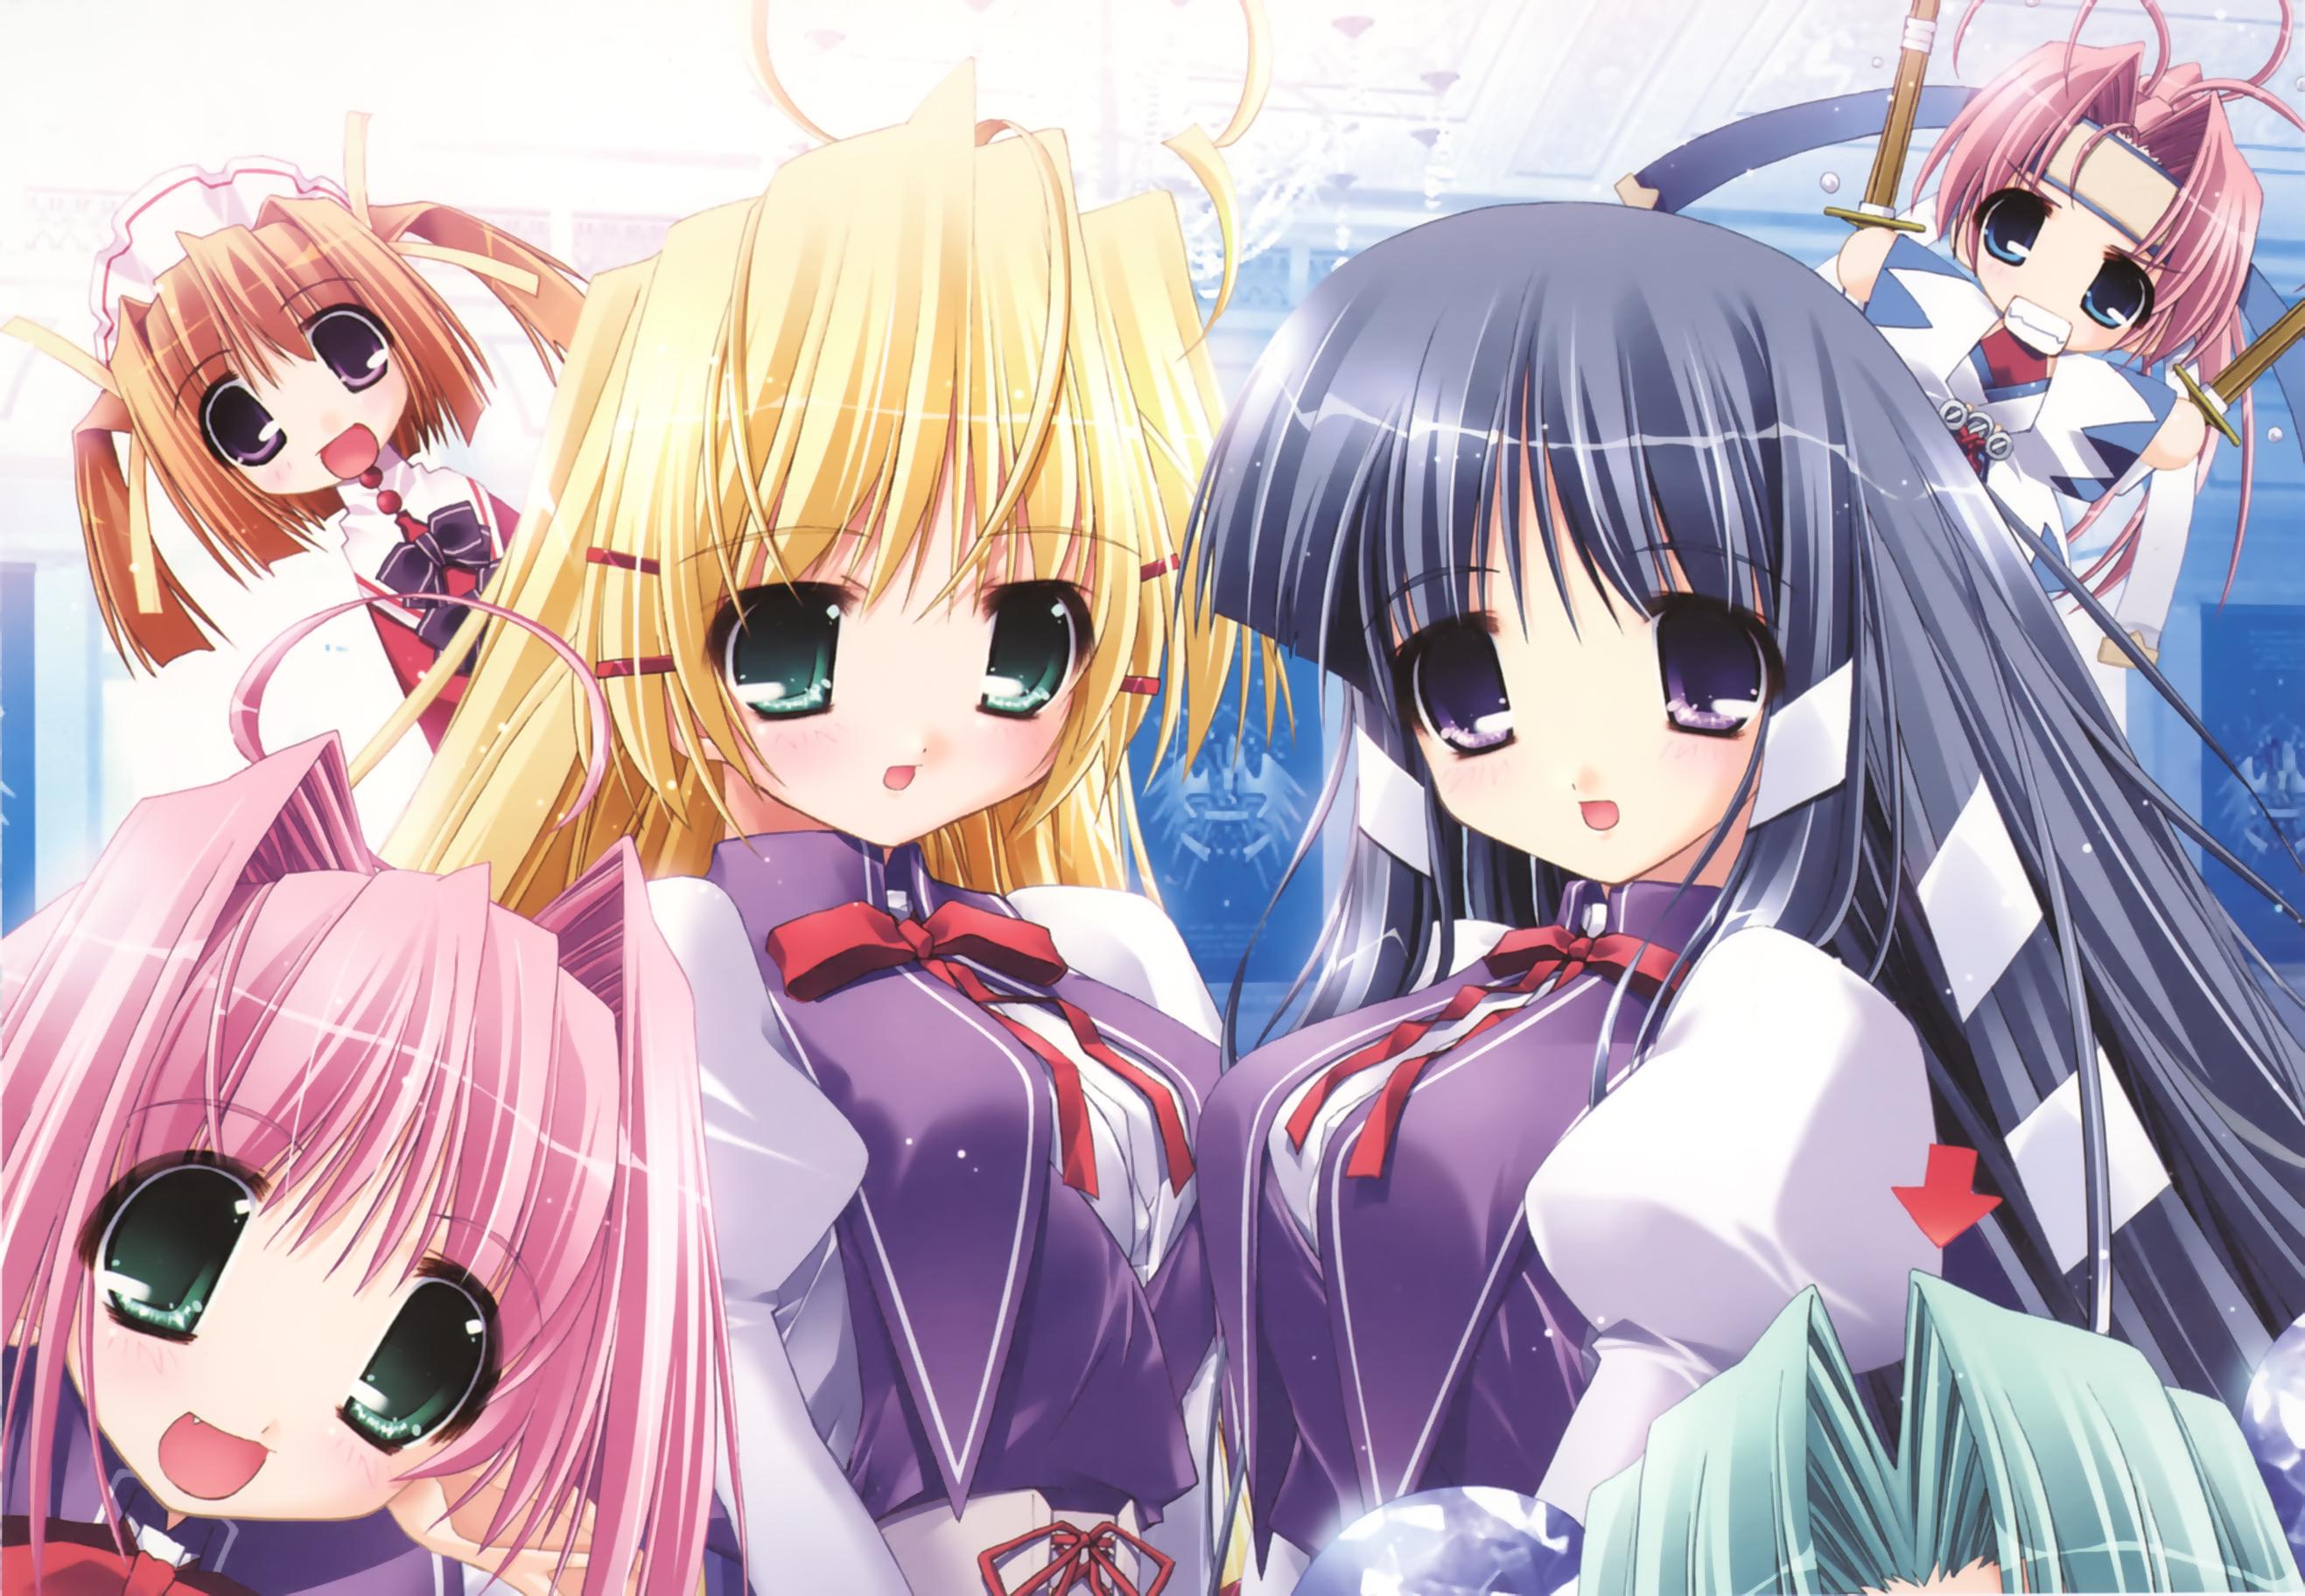 Animation Movie Love Wallpaper : Anime Love Wallpapers for Desktop - WallpaperSafari